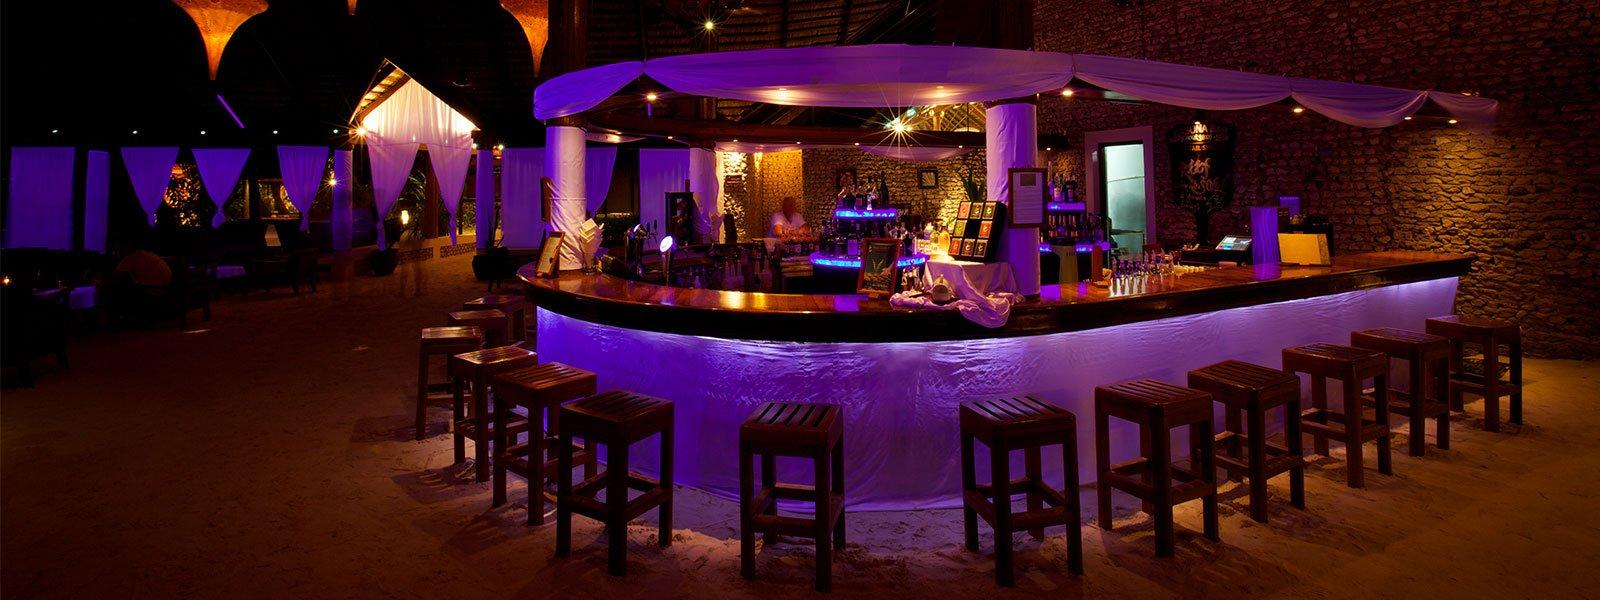 kuredu-restaurants-babuna_1600x600